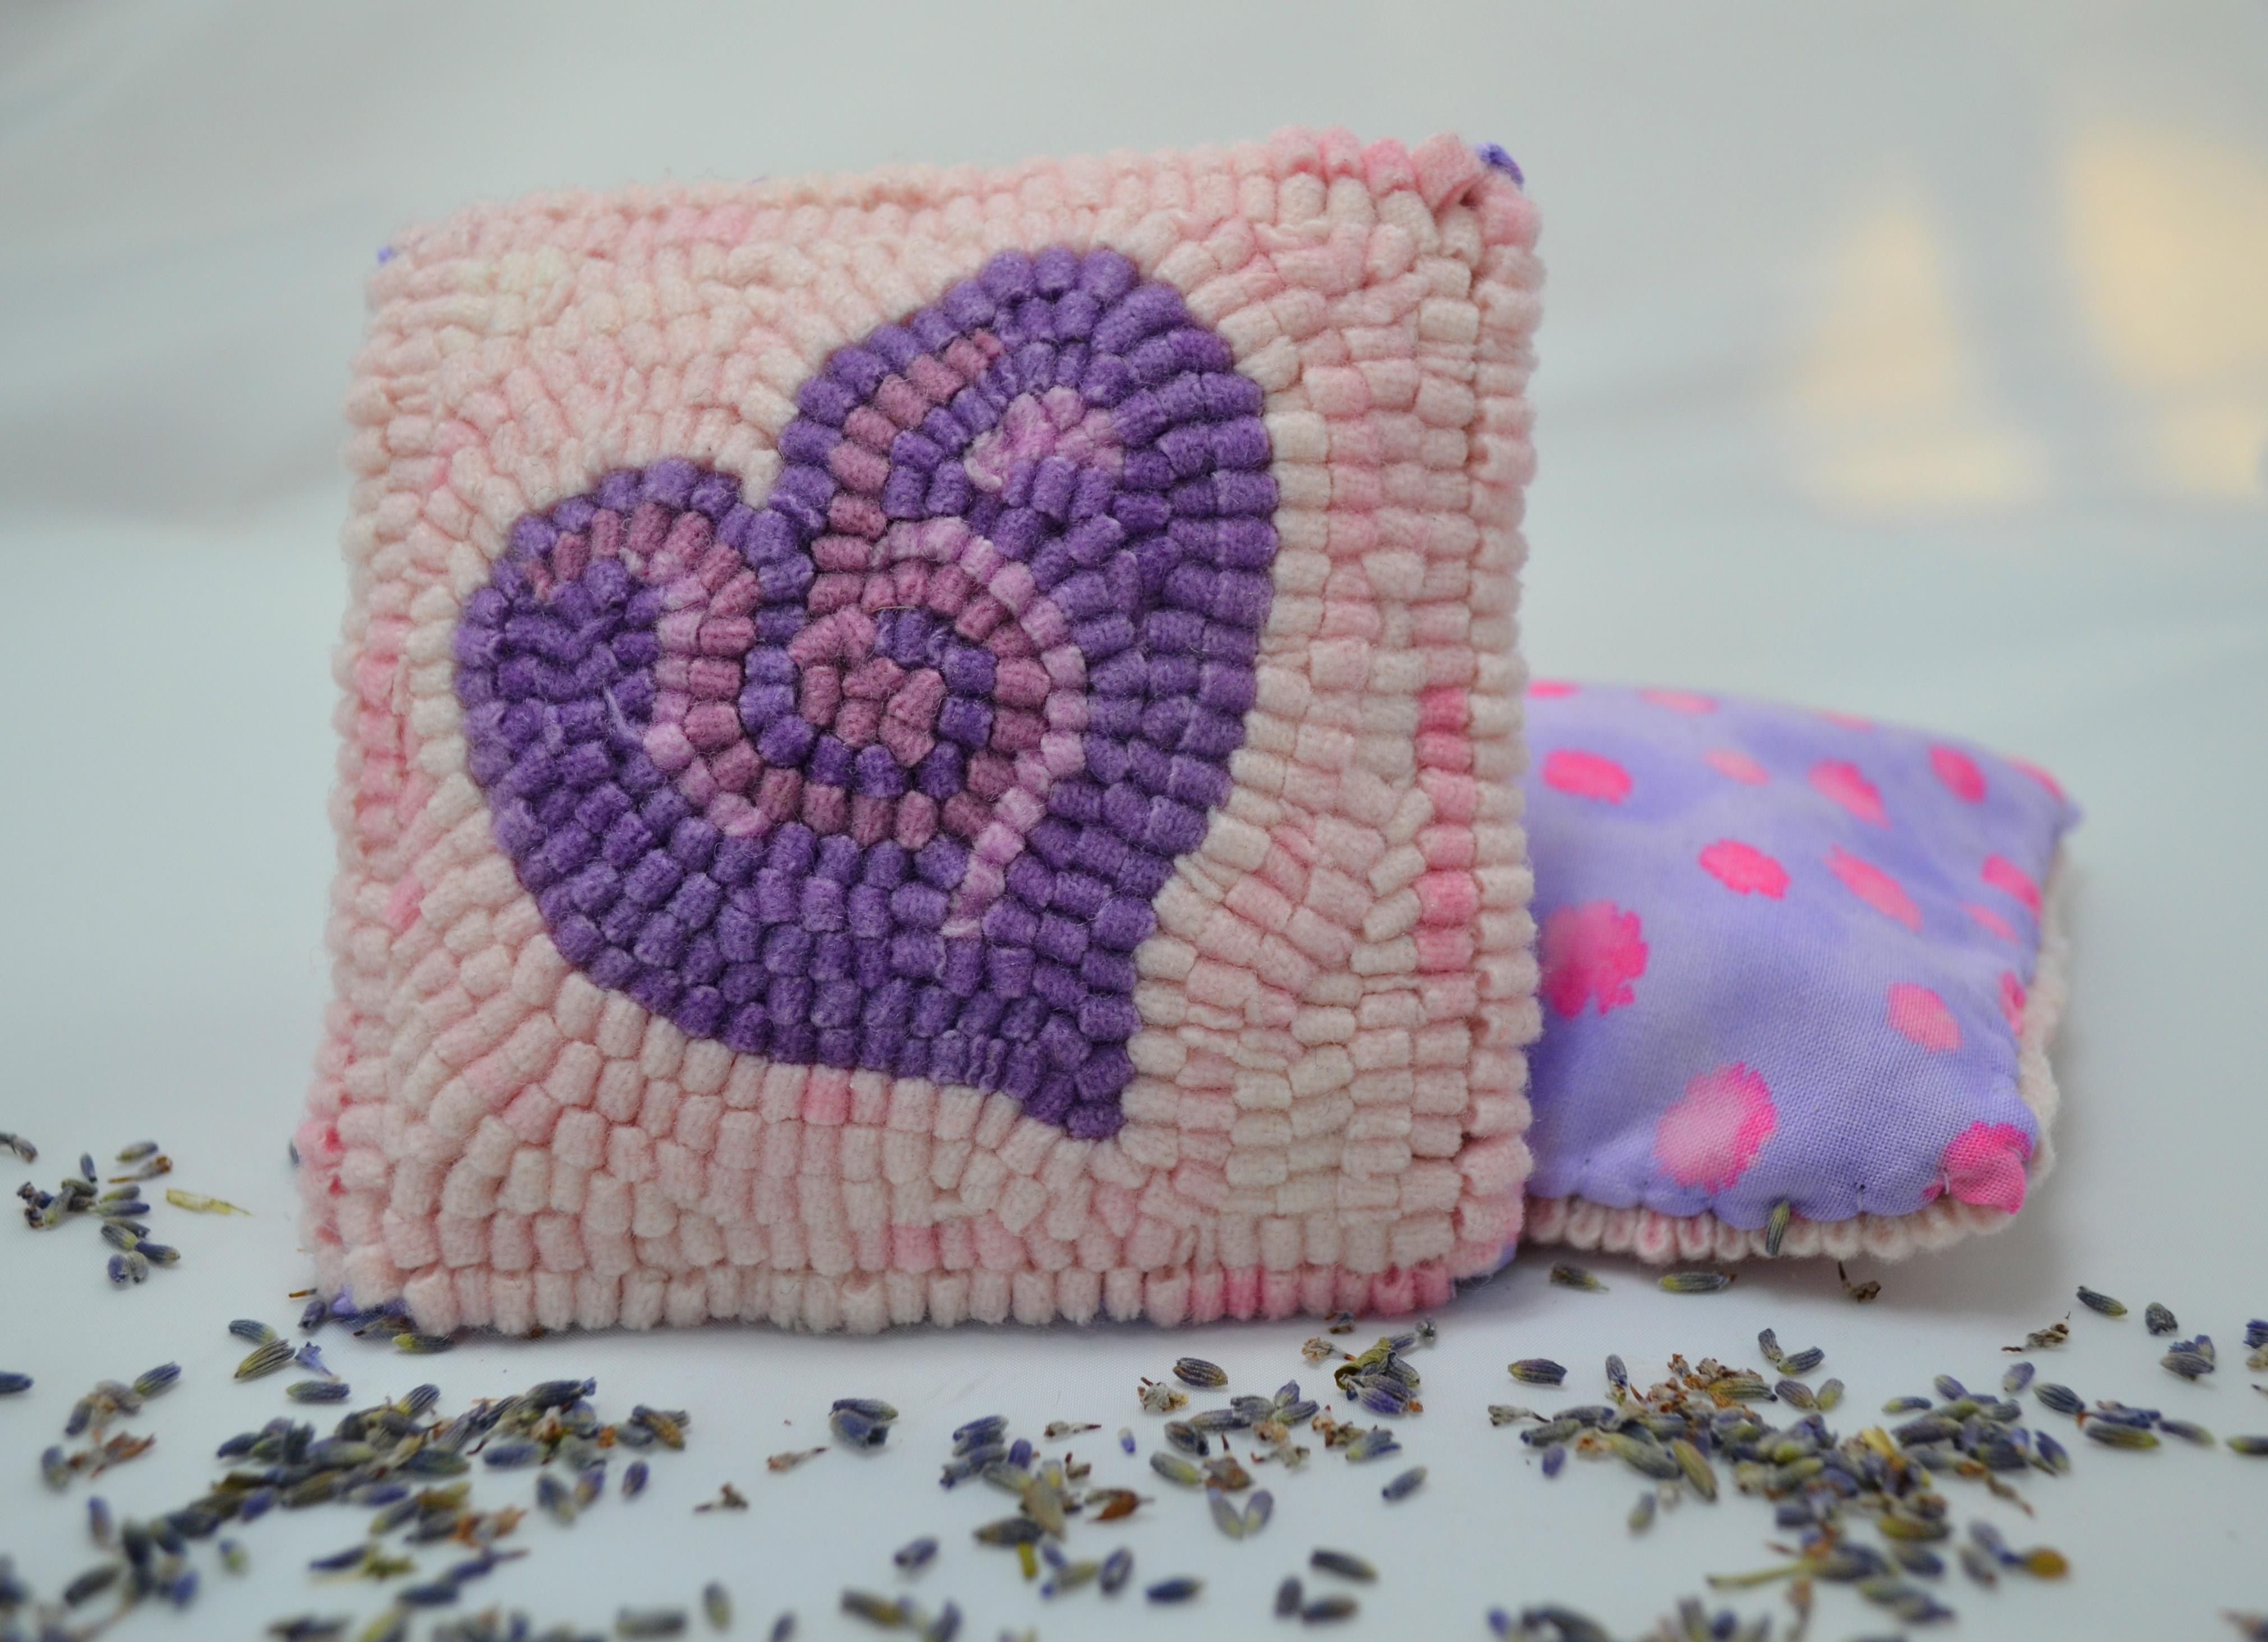 koipillow pillows buckwheat pillow htm